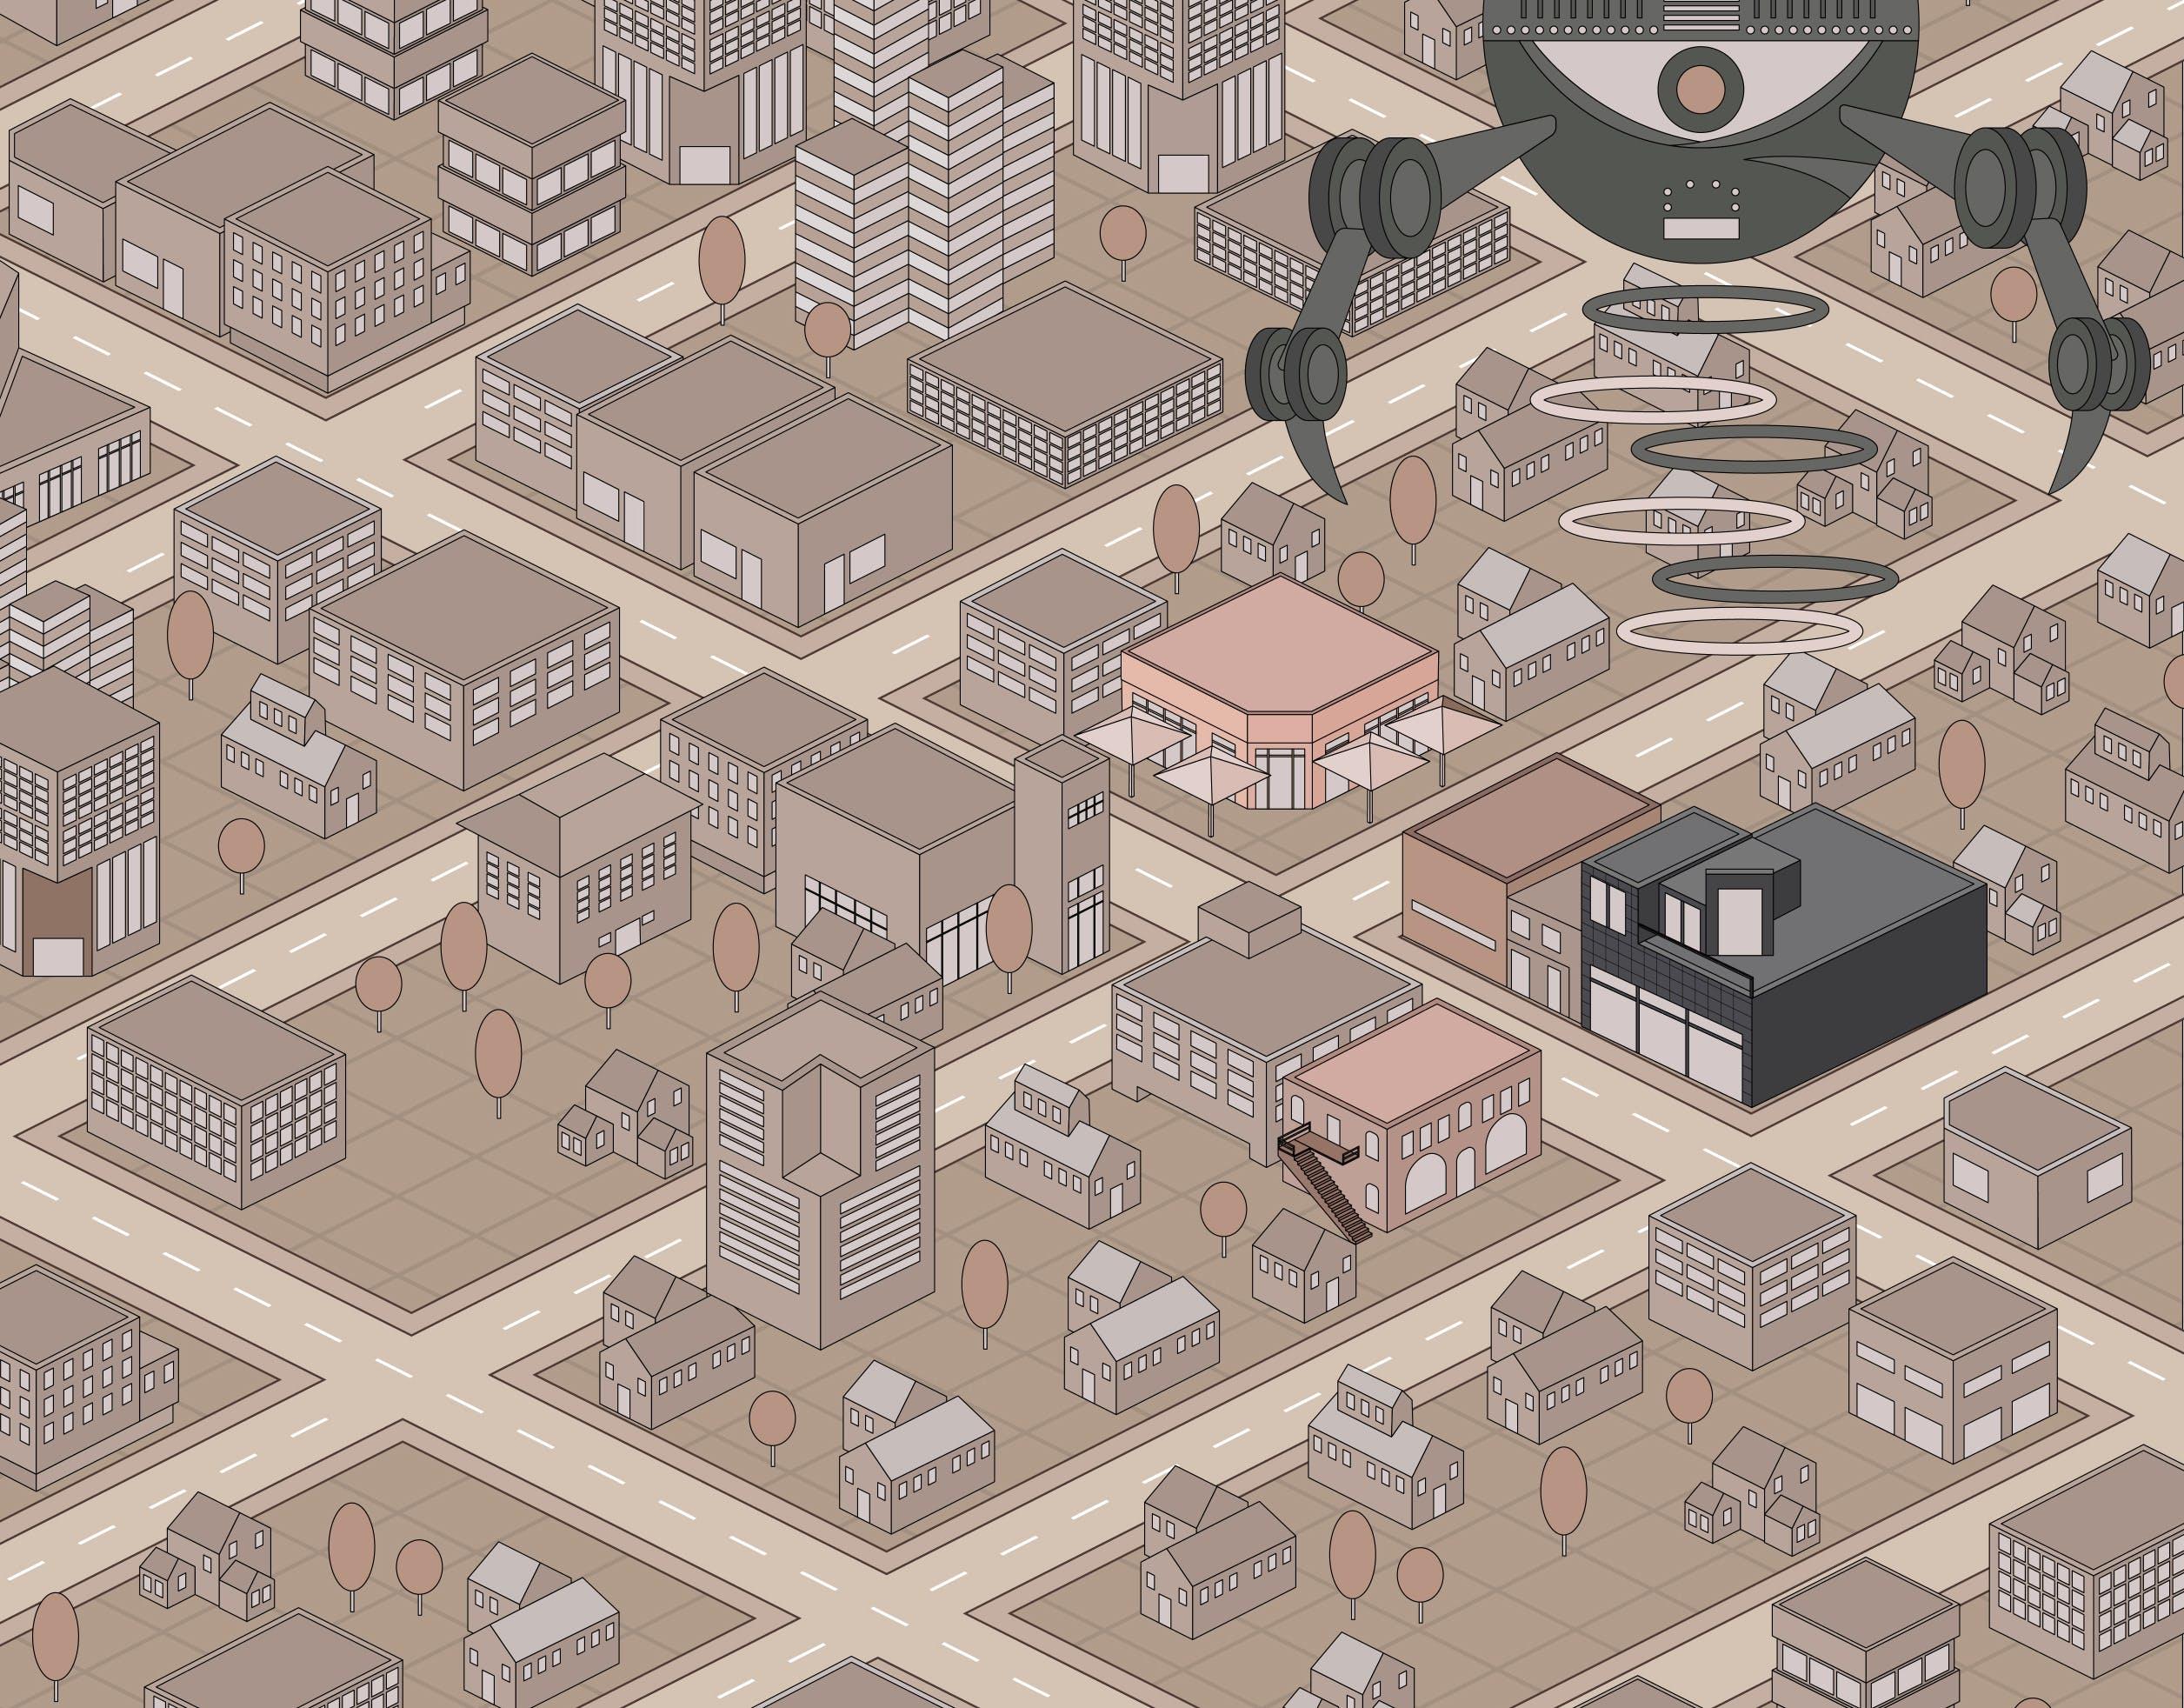 Isometric Illustration that Traffics in Incongruities